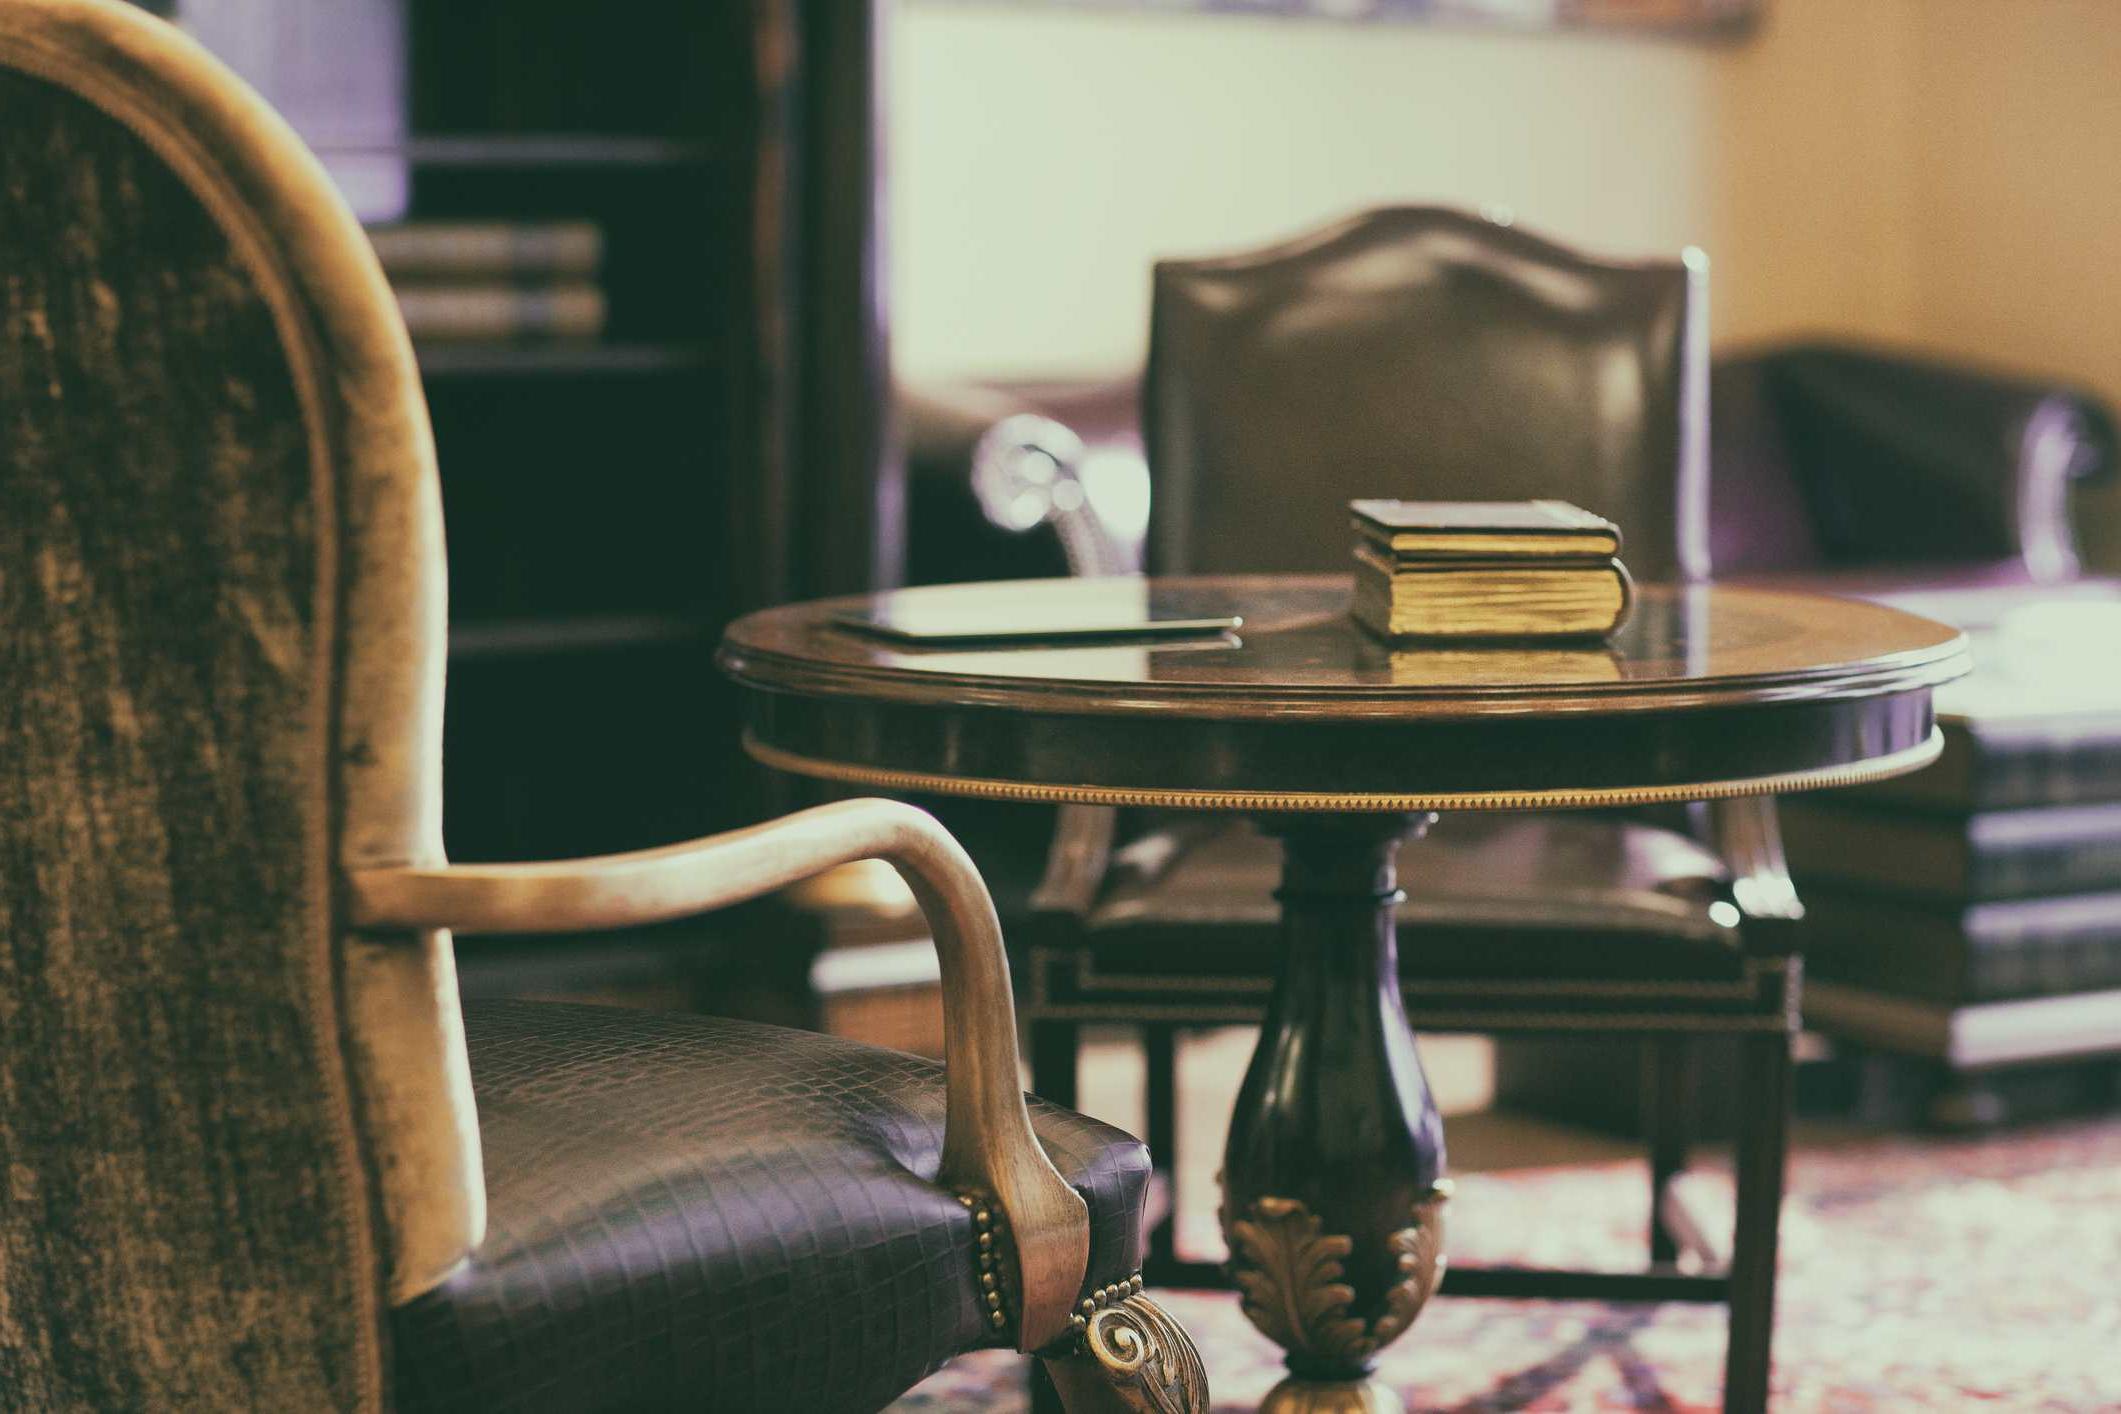 Donde Vender Muebles Usados En Madrid Thdr 10 Consejos Para Vender Tus Muebles Usados